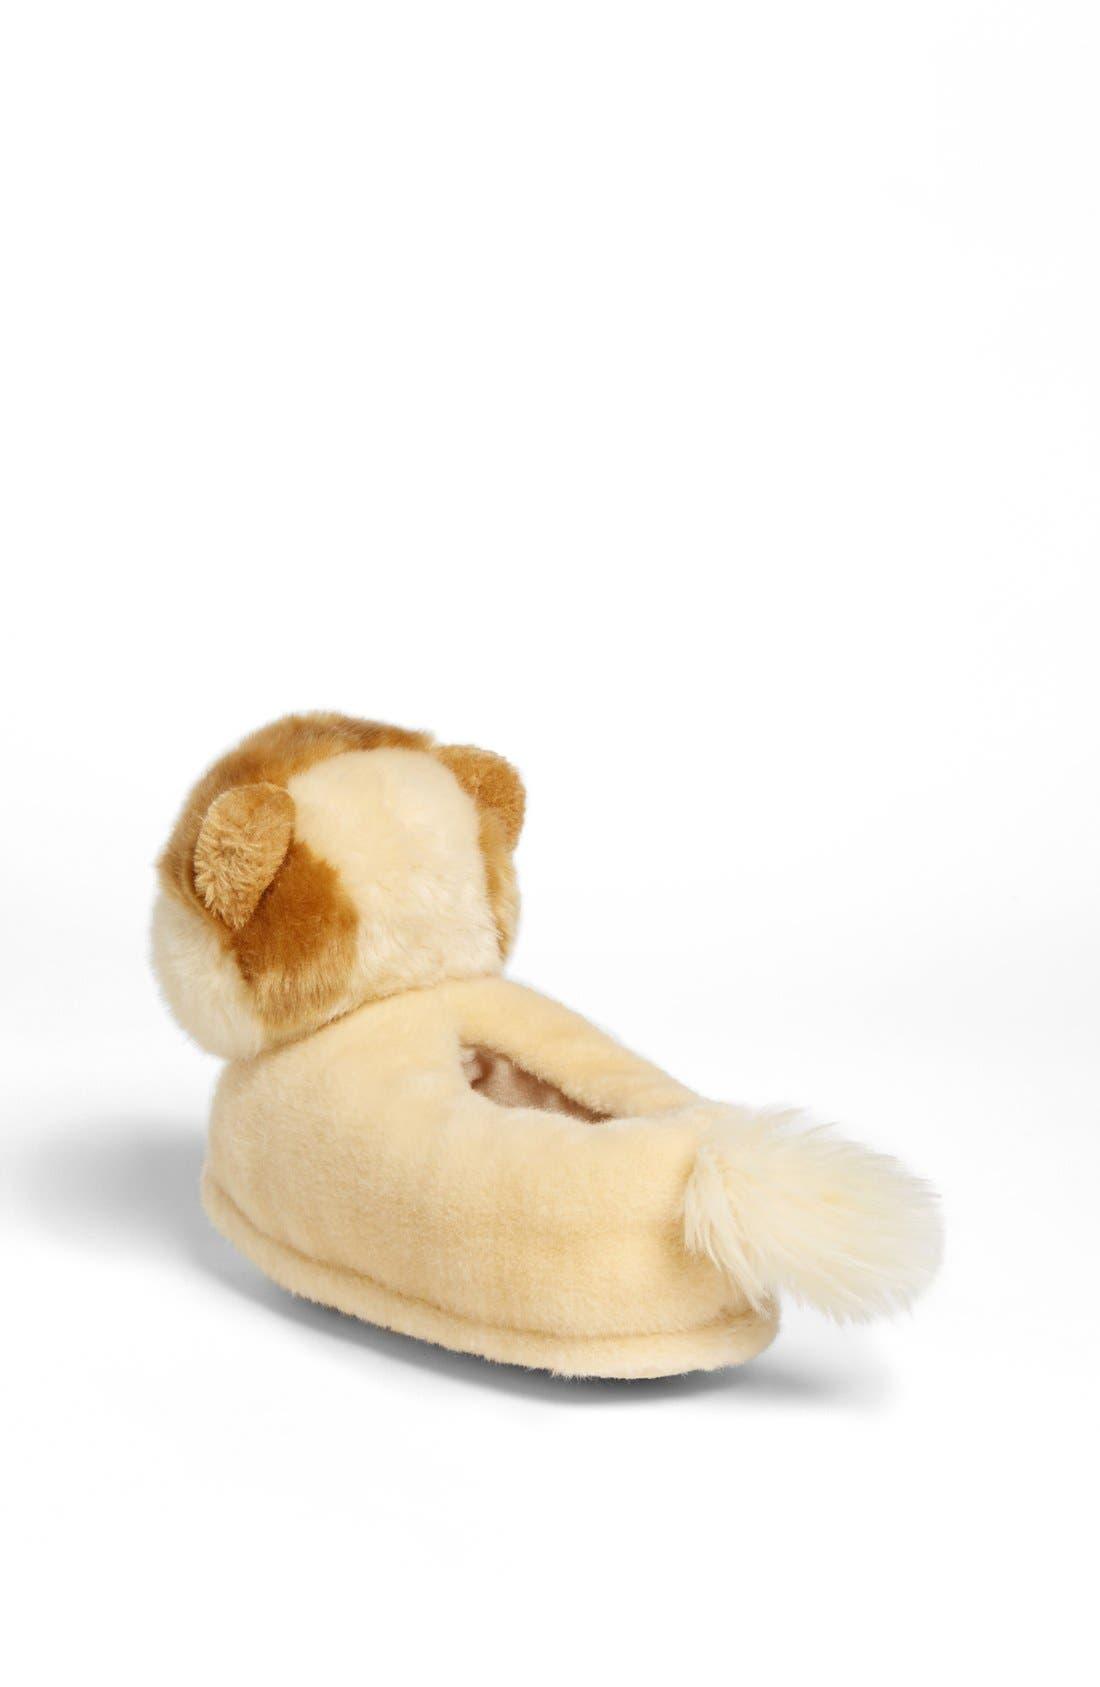 SG FOOTWEAR, 'Boo - The World's Cutest Dog' Slipper, Alternate thumbnail 4, color, 200